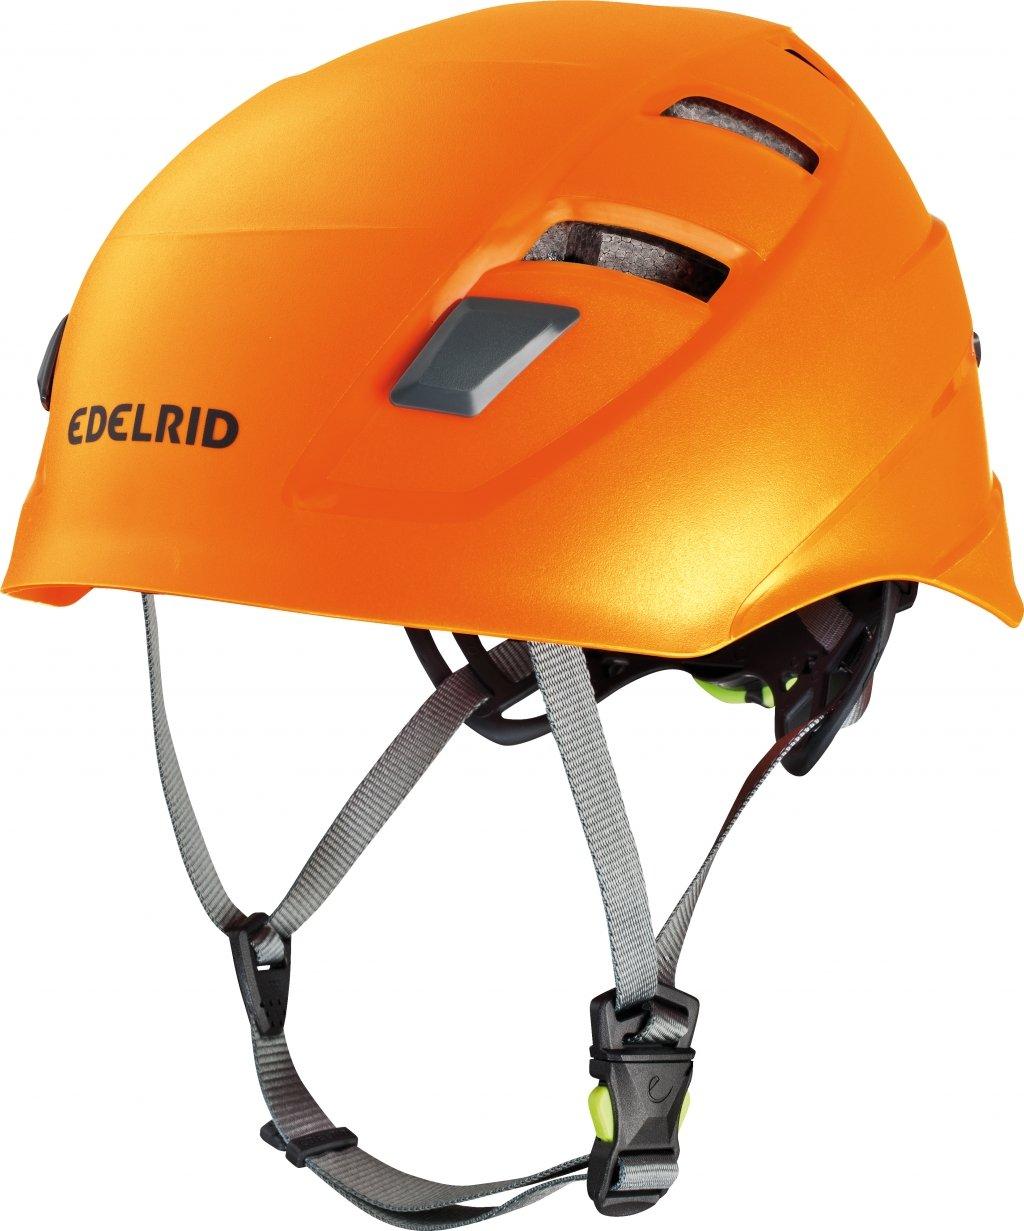 EDELRID - Zodiac Climbing Helmet, Sahara